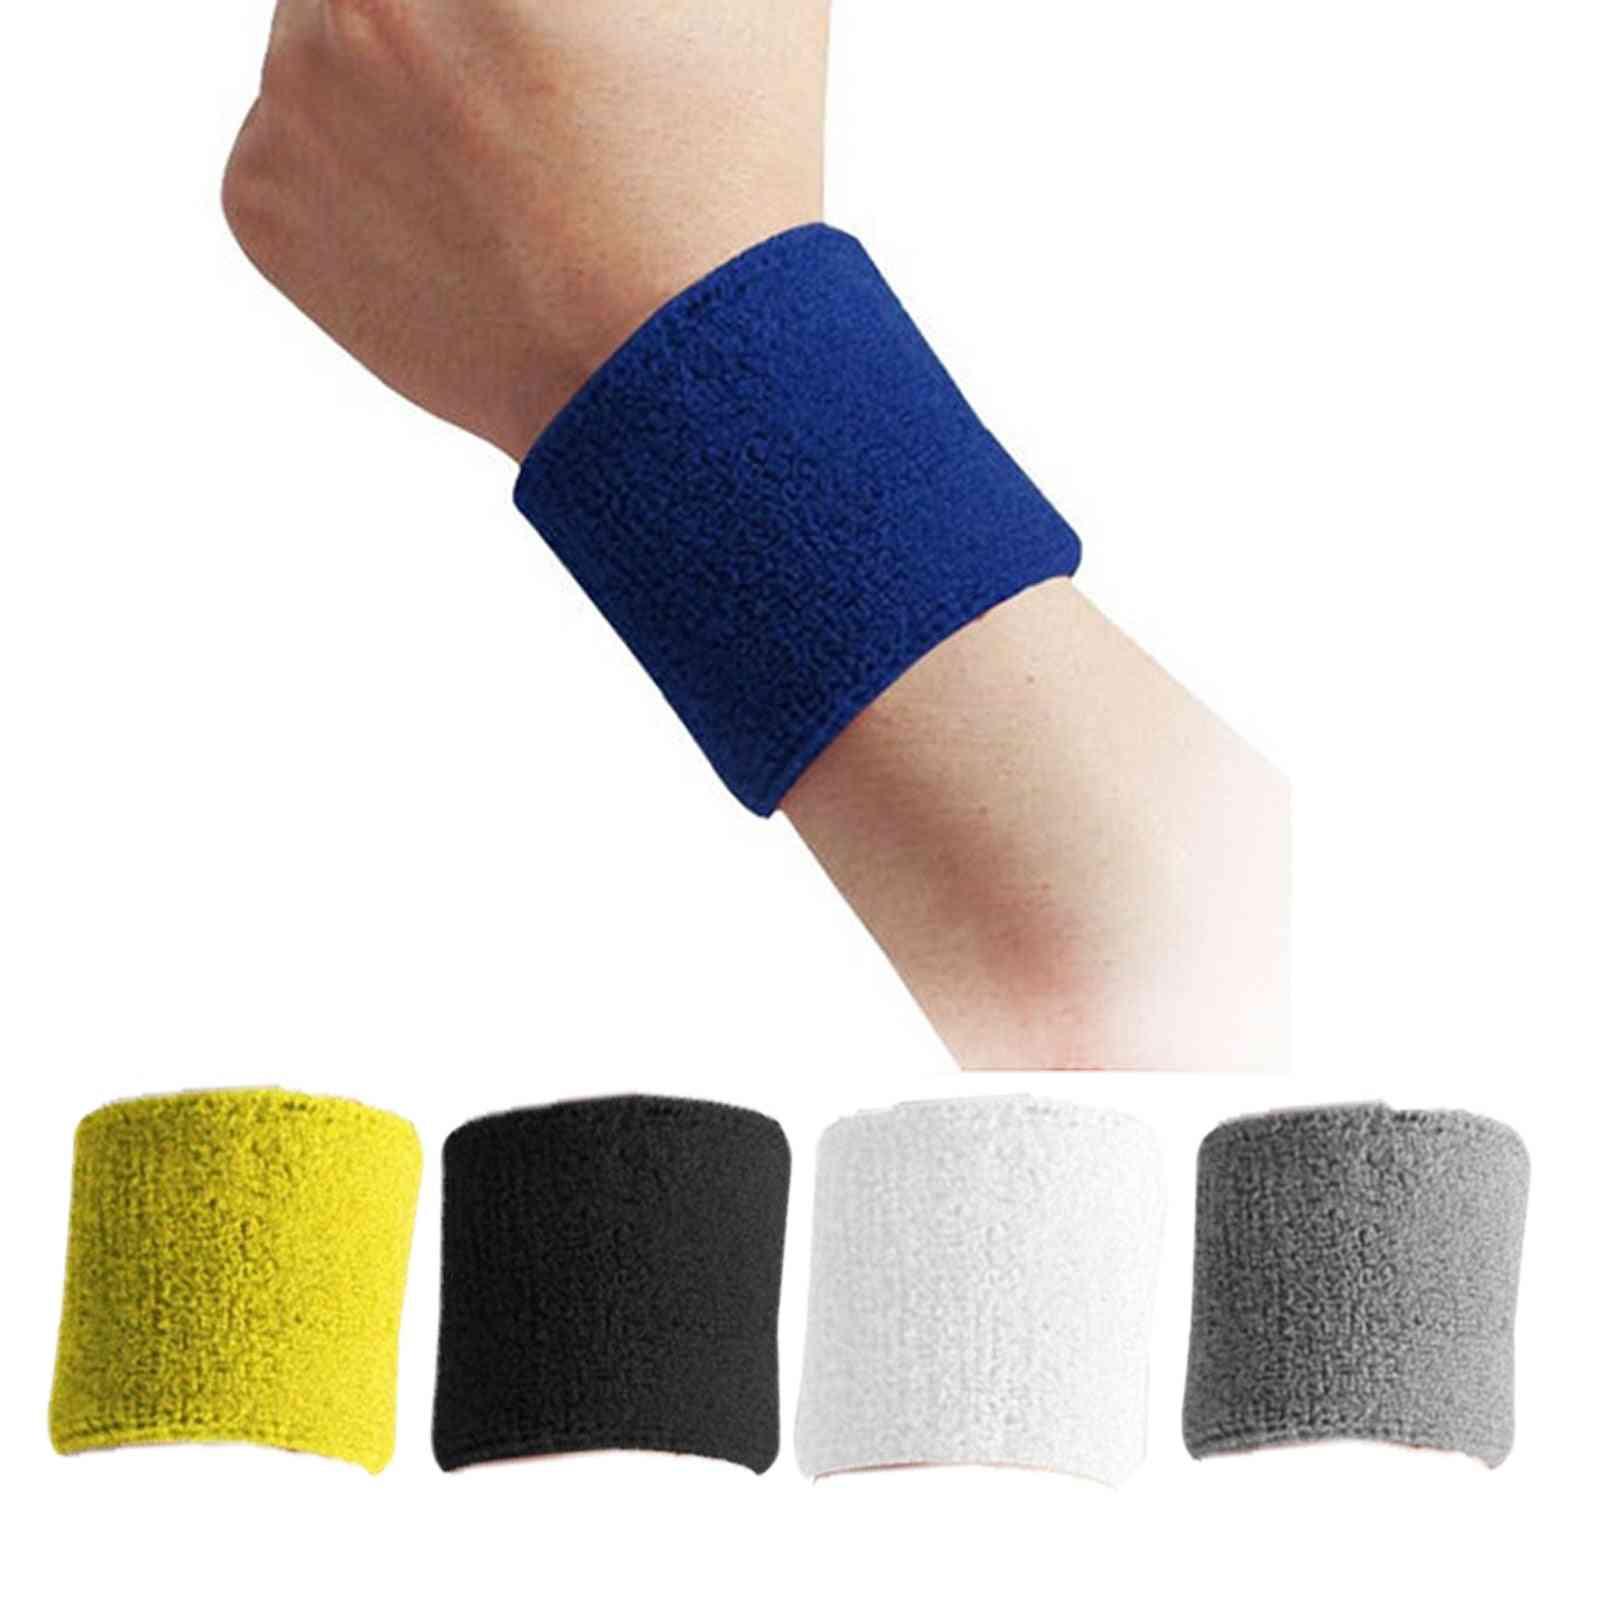 Cotton Wristbands Sport & Wrist Support Brace Wraps Guards